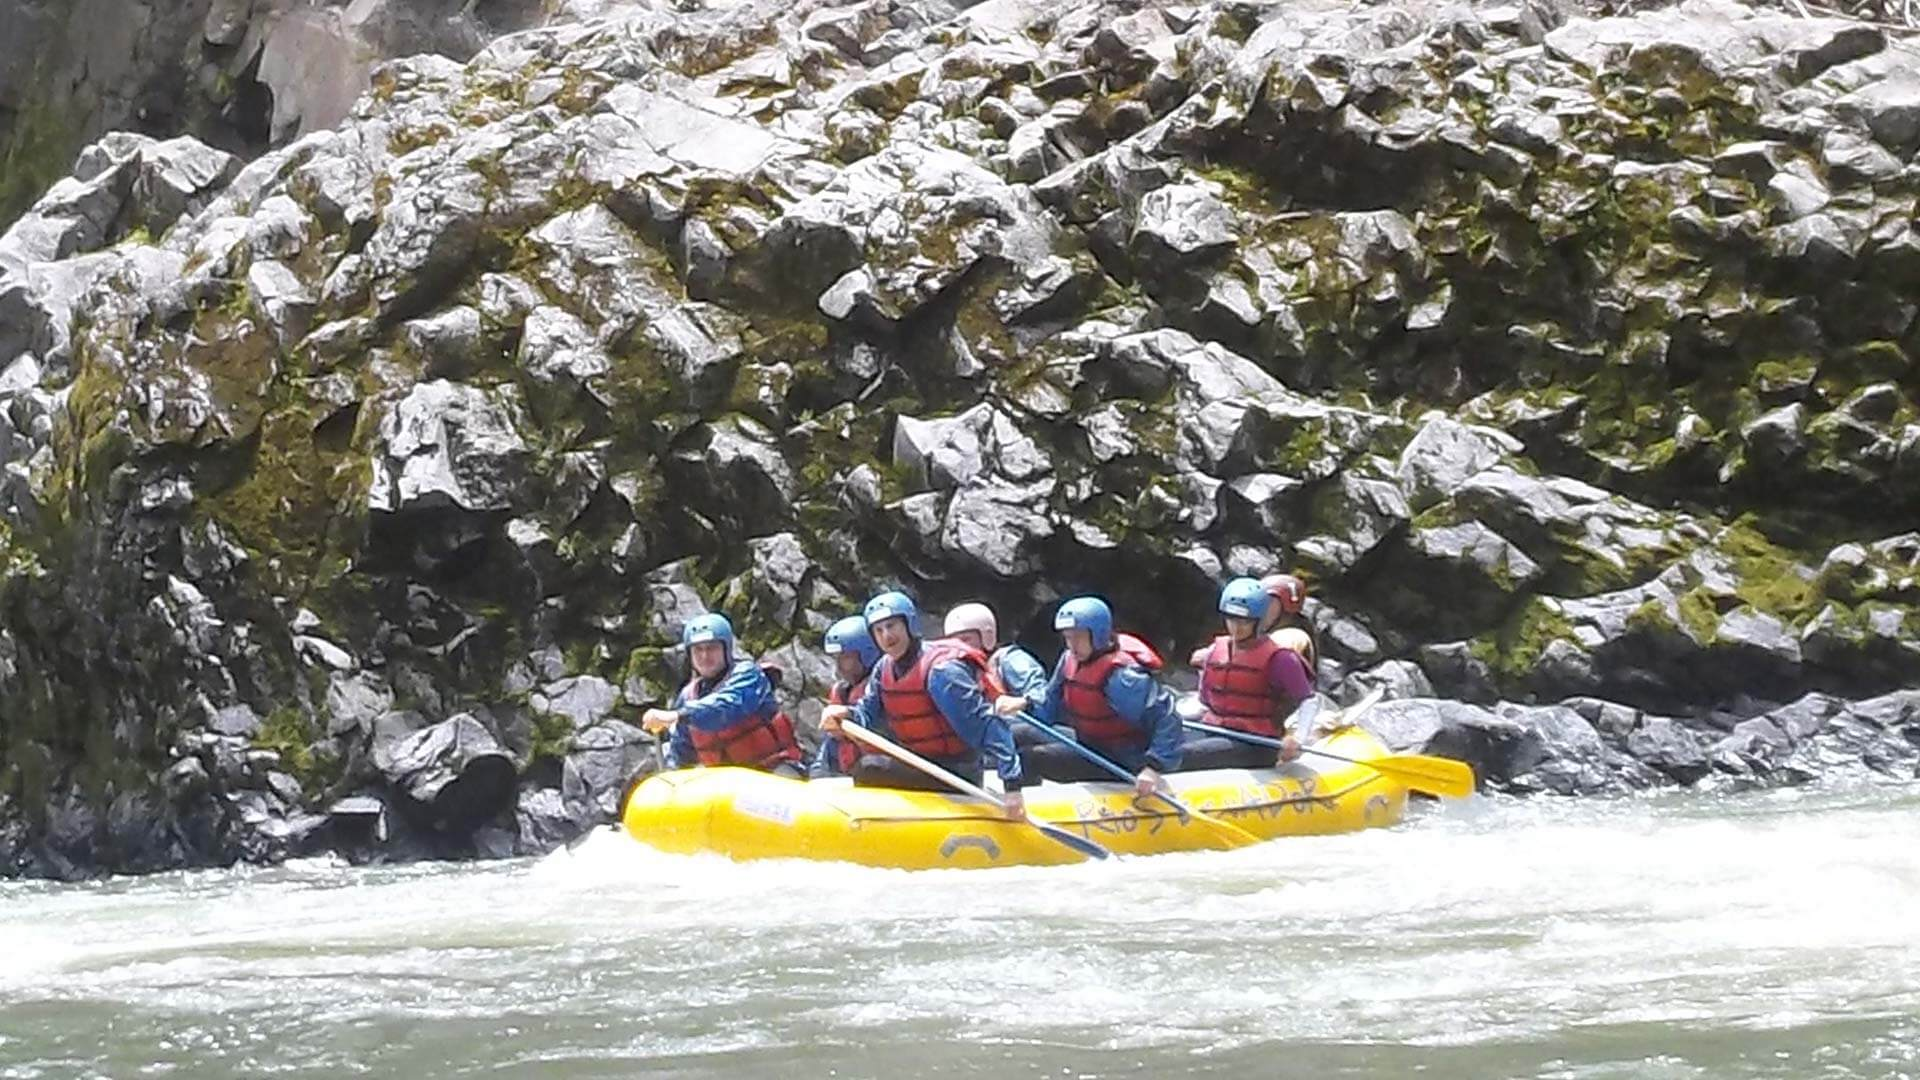 ecuador rafting tour on the quijos river